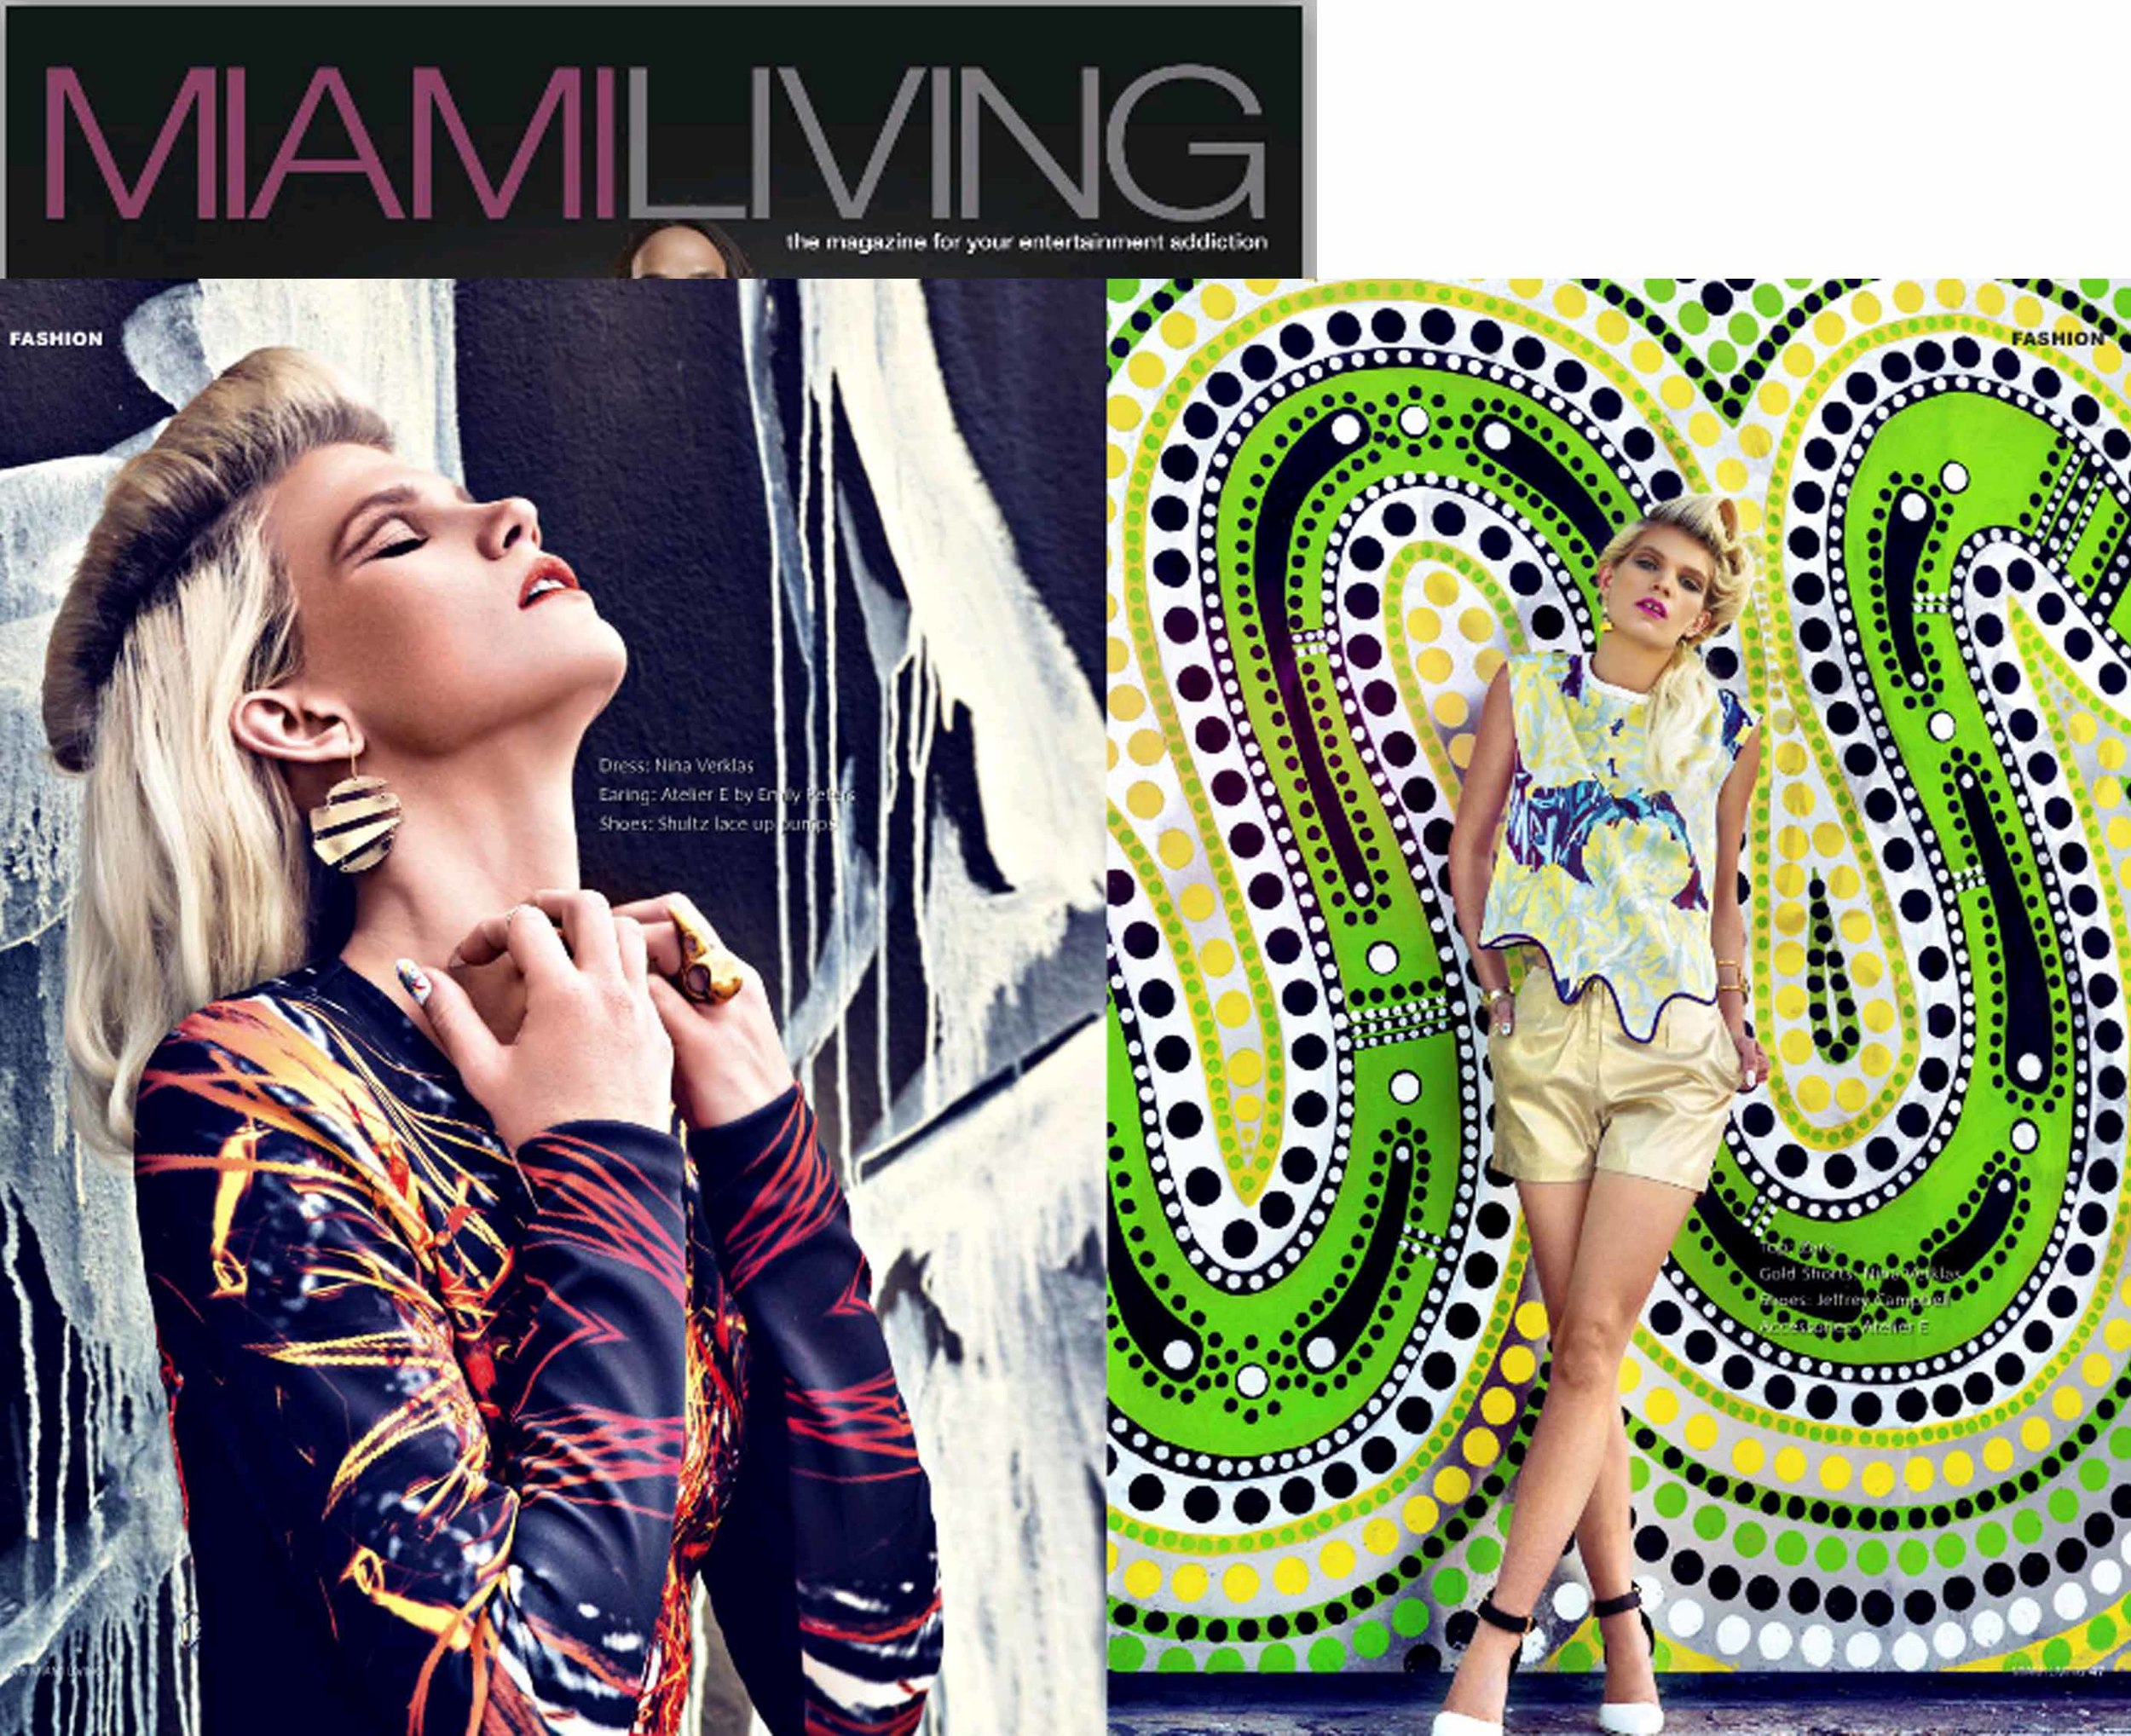 Miami Living Magazine p2.jpg